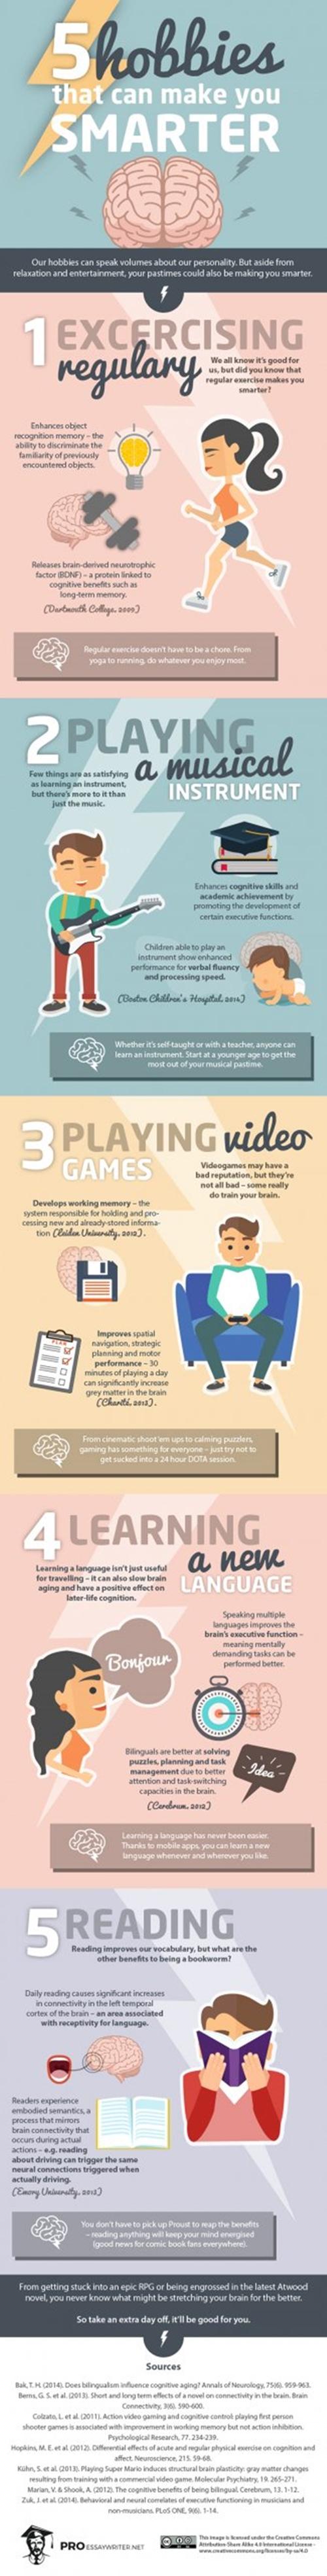 hobbies-infographic